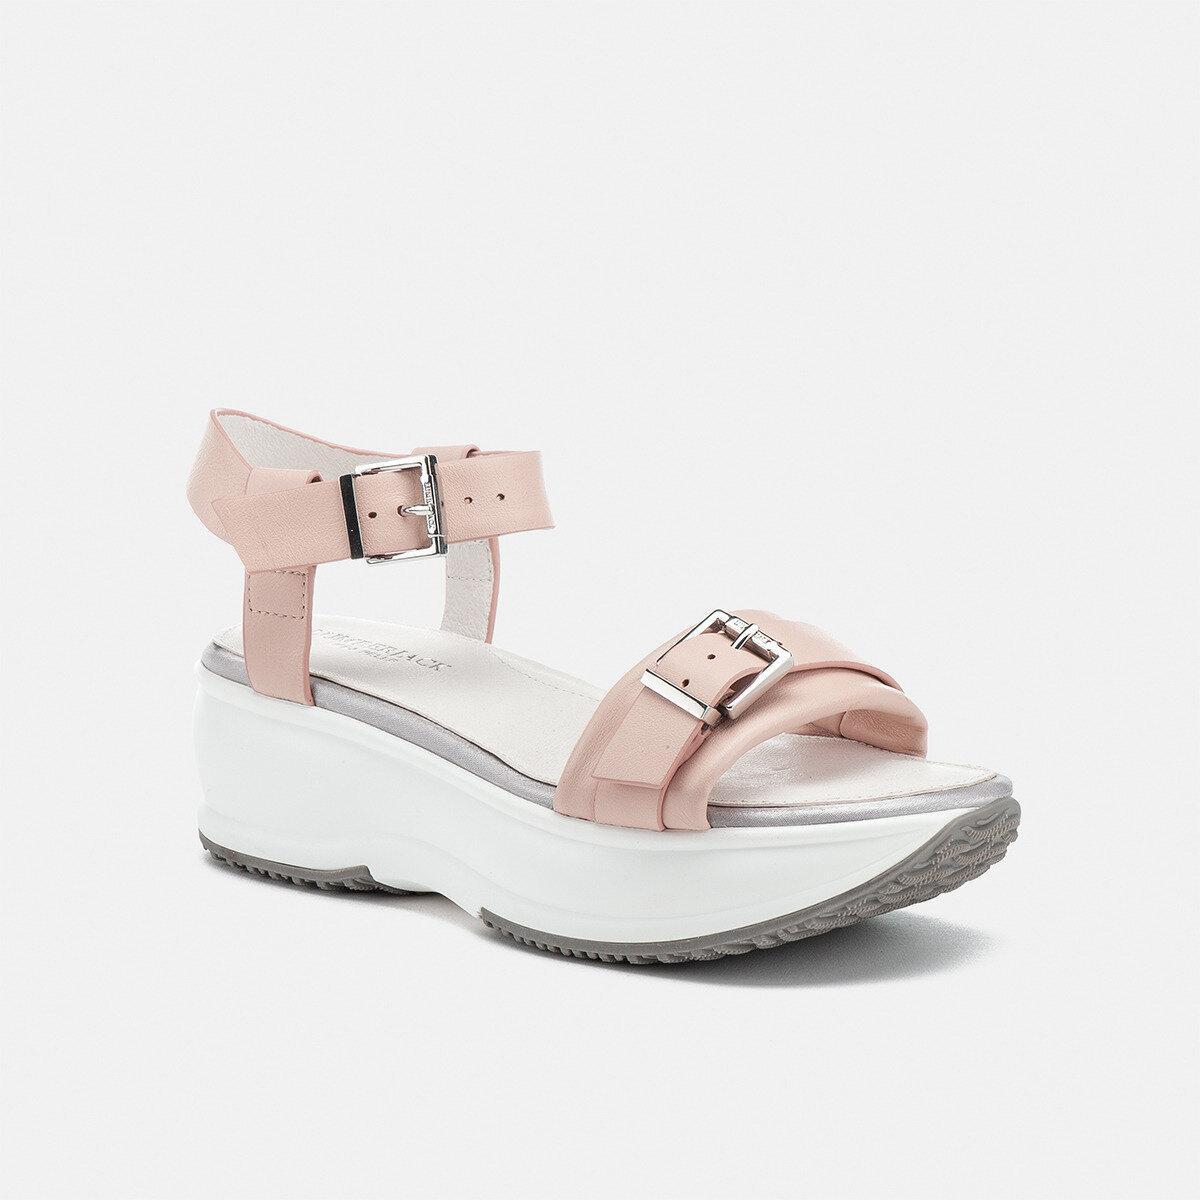 SONYA ROSE Woman Sandals